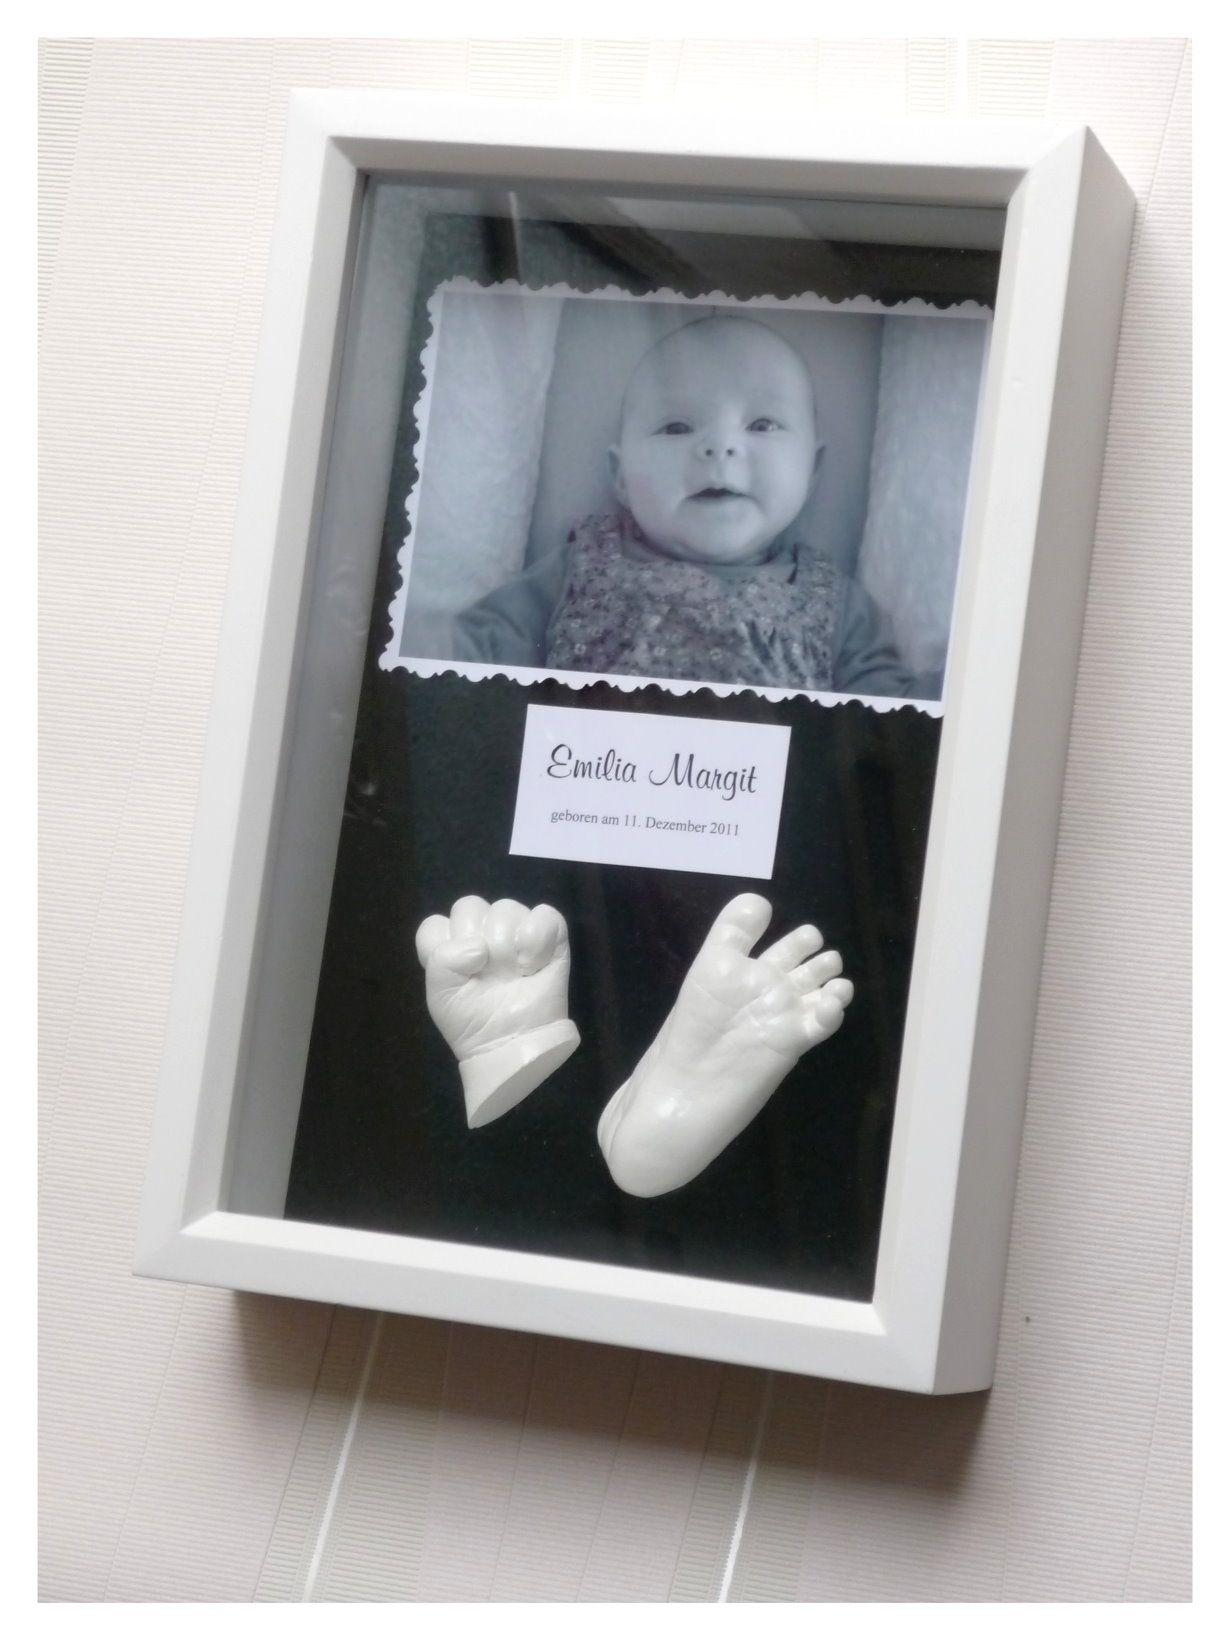 3D - Babyabdrücke in Erfurt   Basteln, Bauen, Kleben usw ...